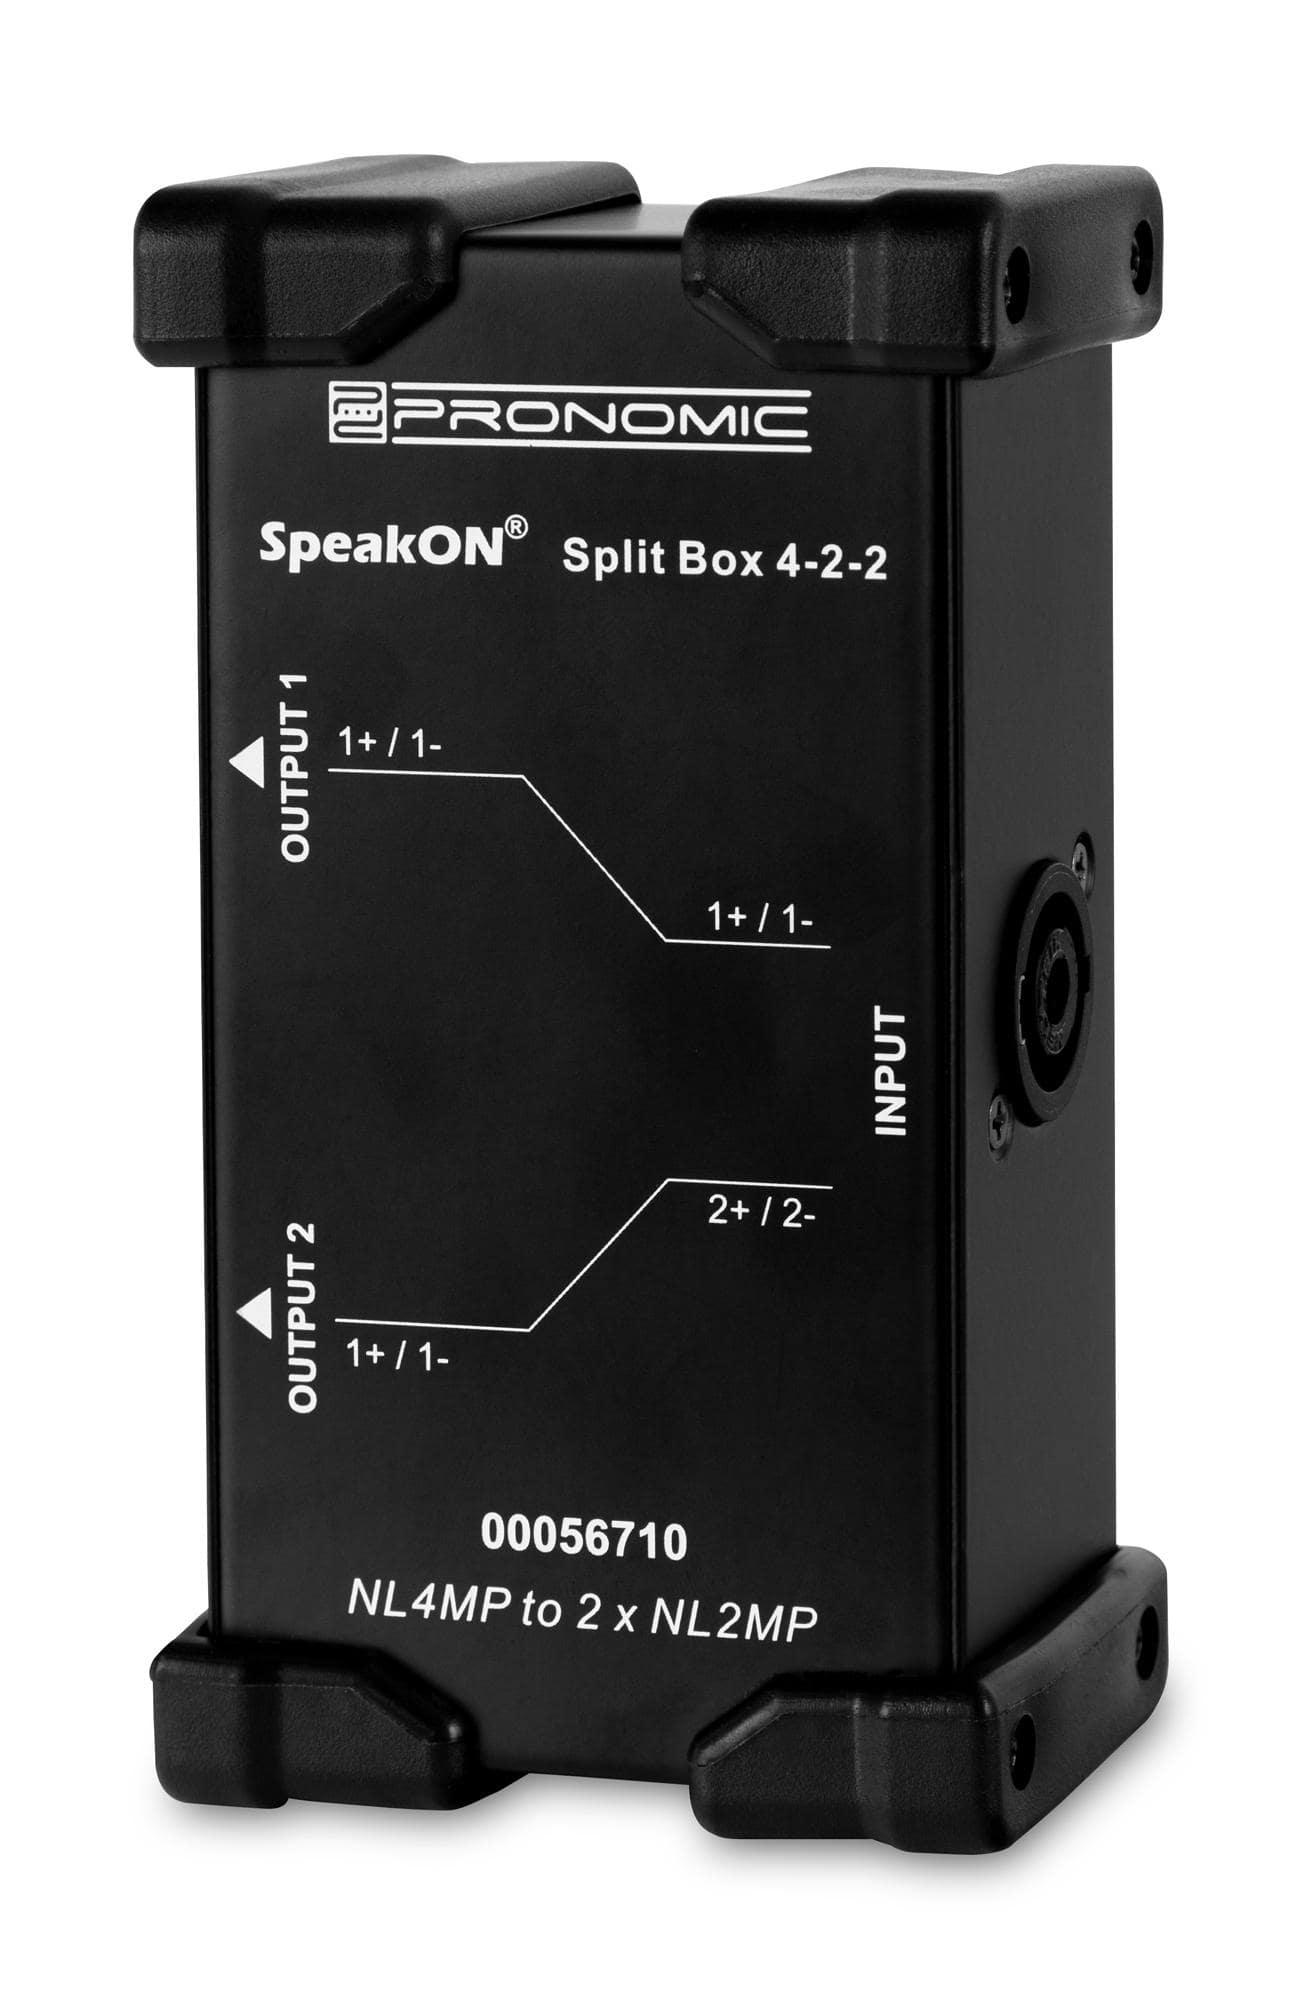 Diboxen - Pronomic Speakon Split Box 4 2 2 - Onlineshop Musikhaus Kirstein